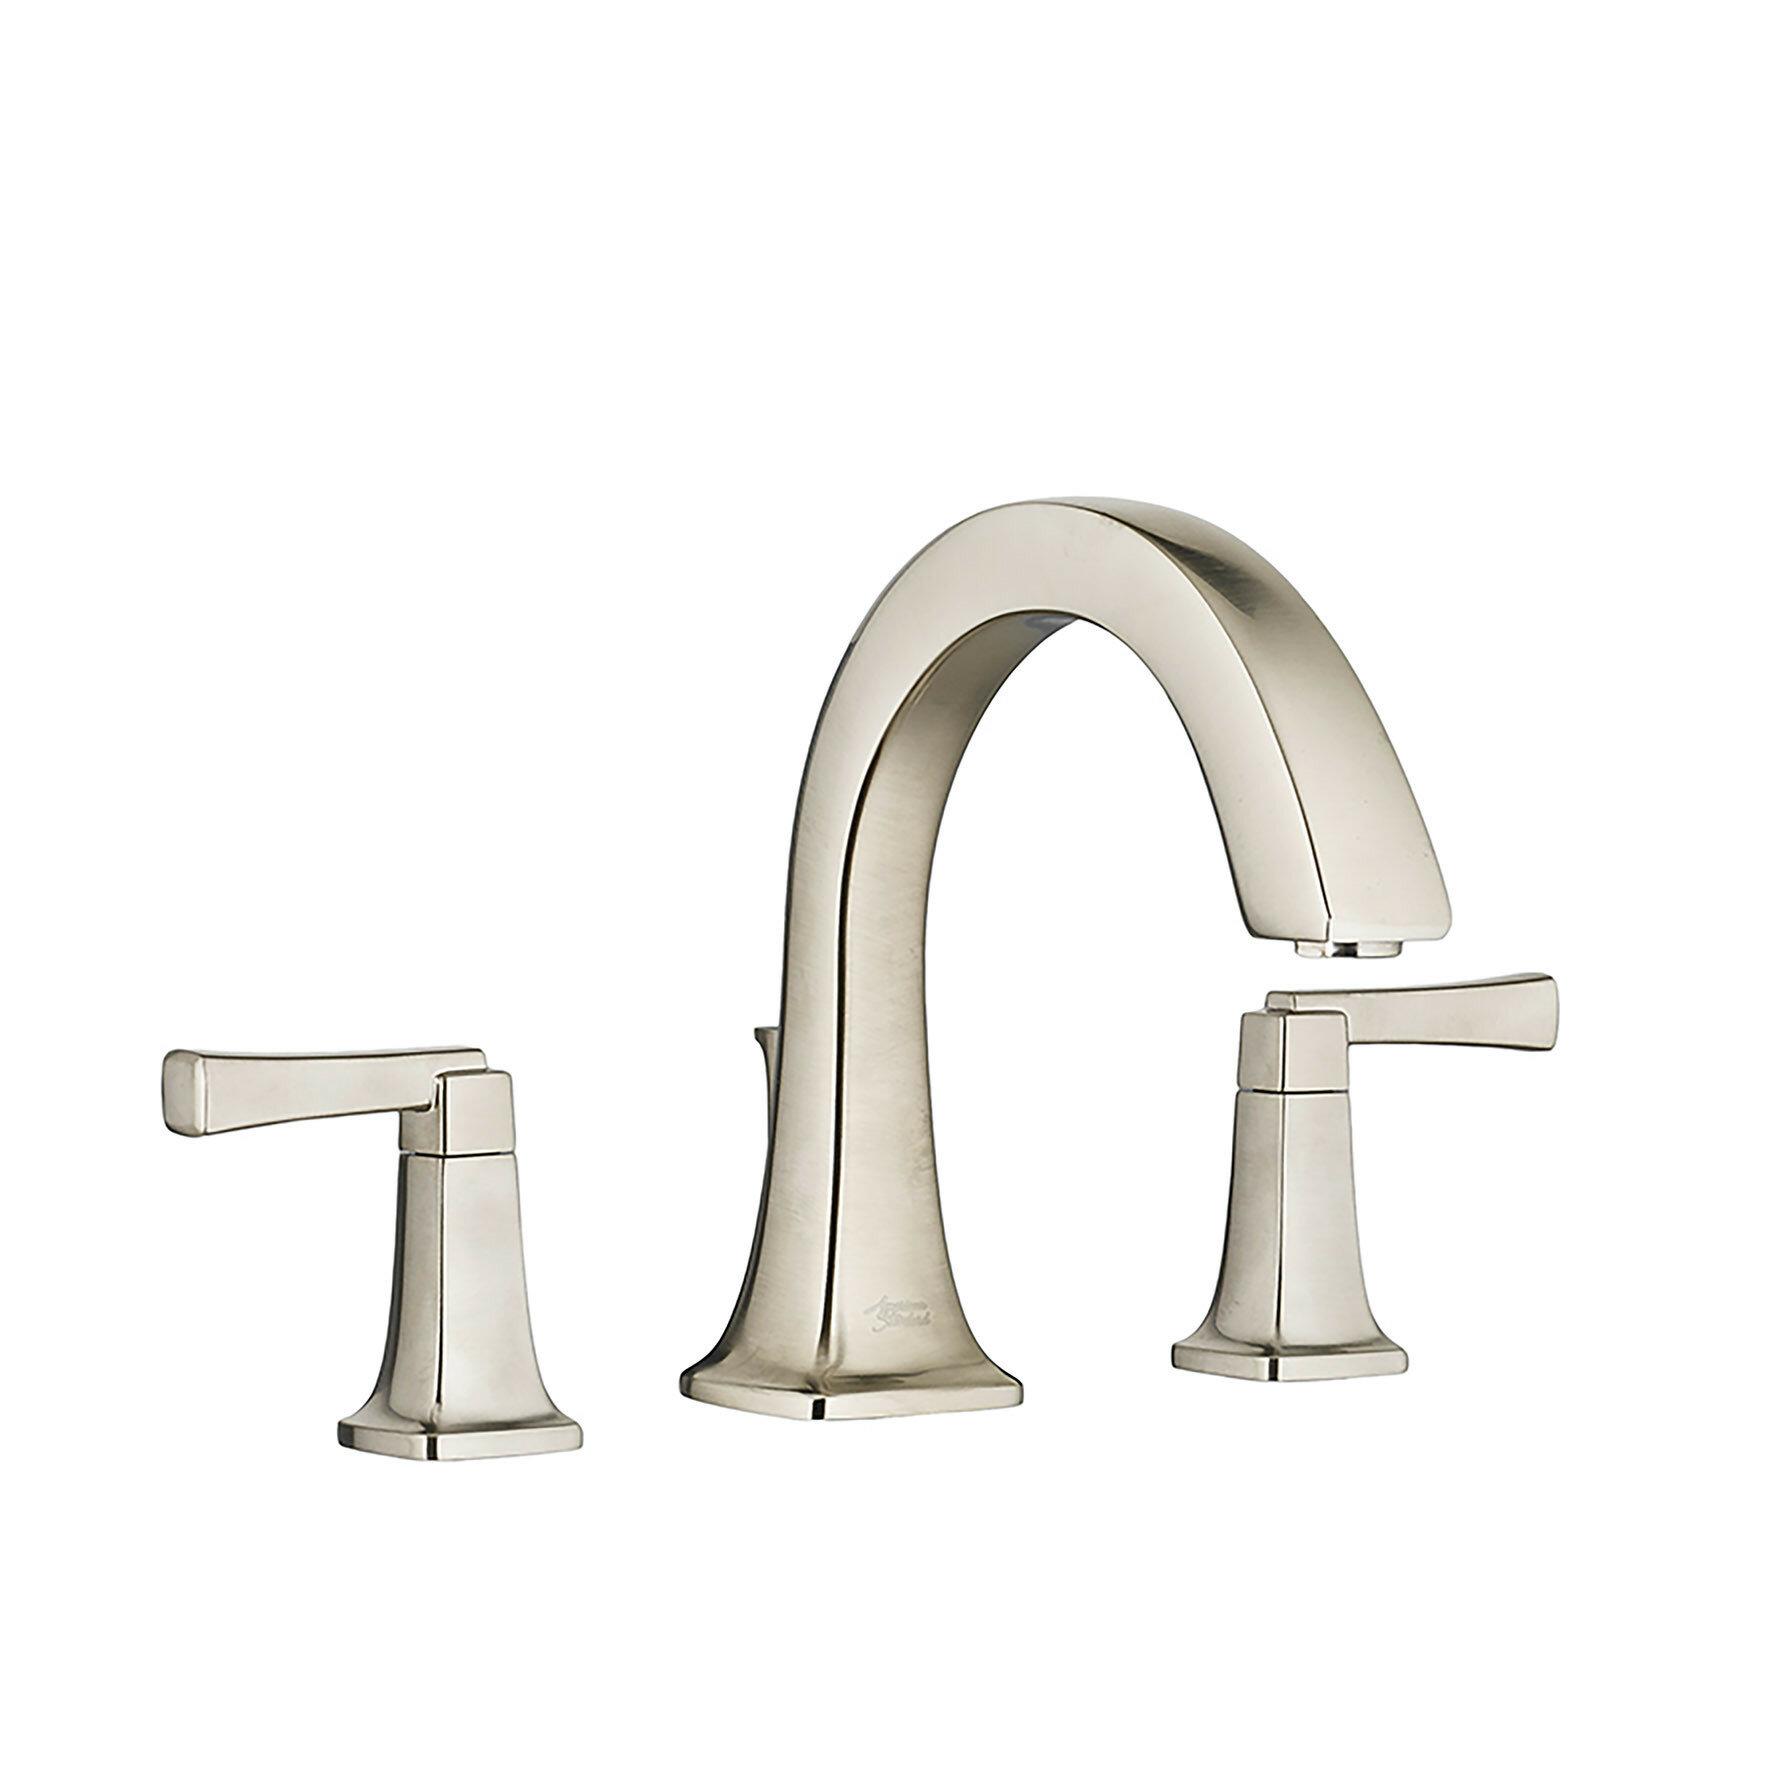 American Standard Townsend Double Handle Deck Mount Bathtub Faucet | Wayfair